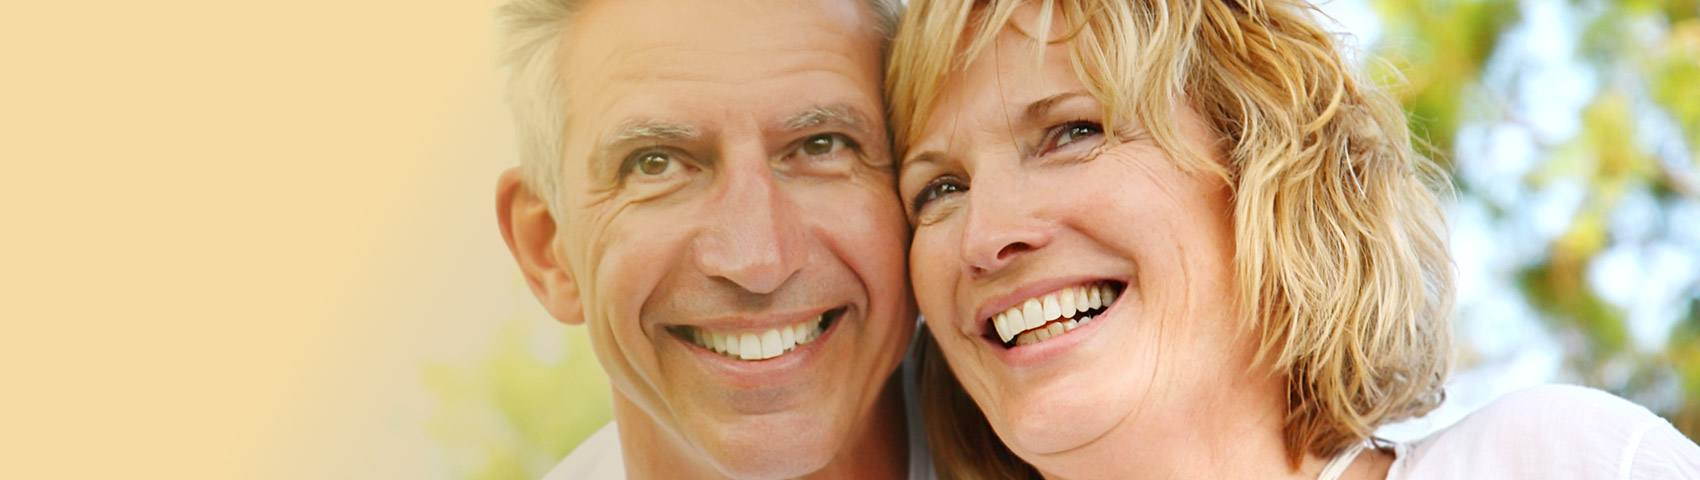 Dentures and Partial Dentures, CA